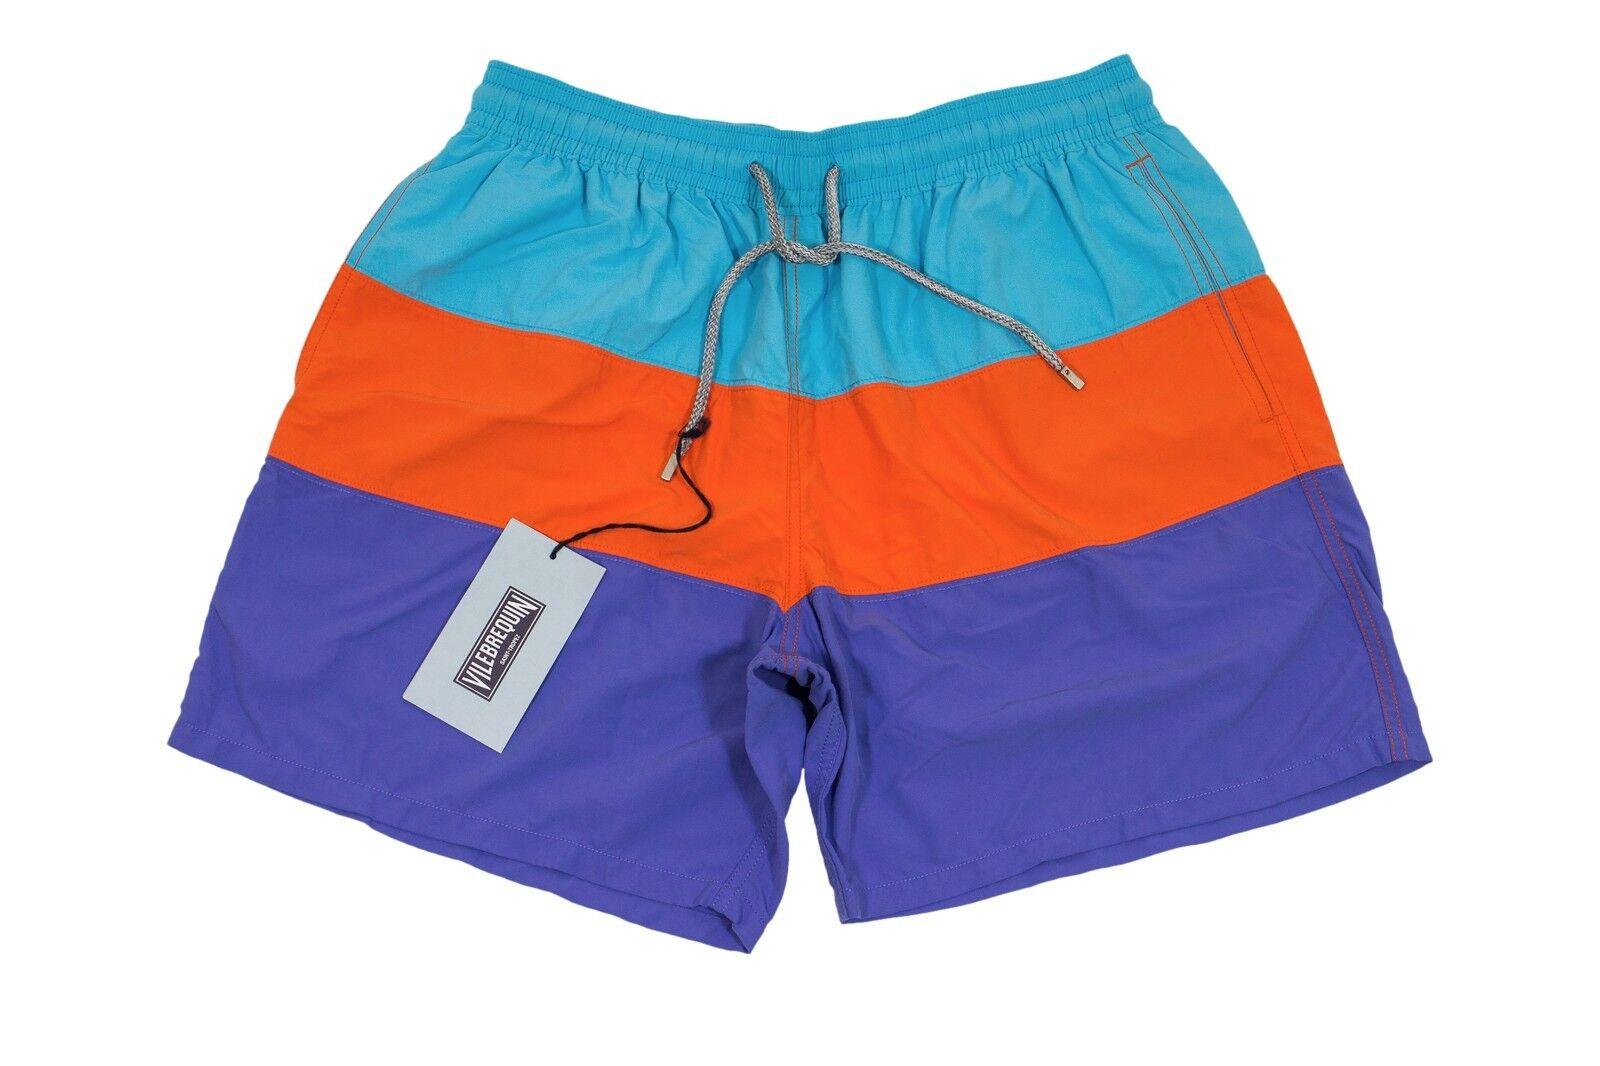 Vilebrequin Polyamide XXL Swim Trunks Lavender orange Turchese Striped - MIXEA